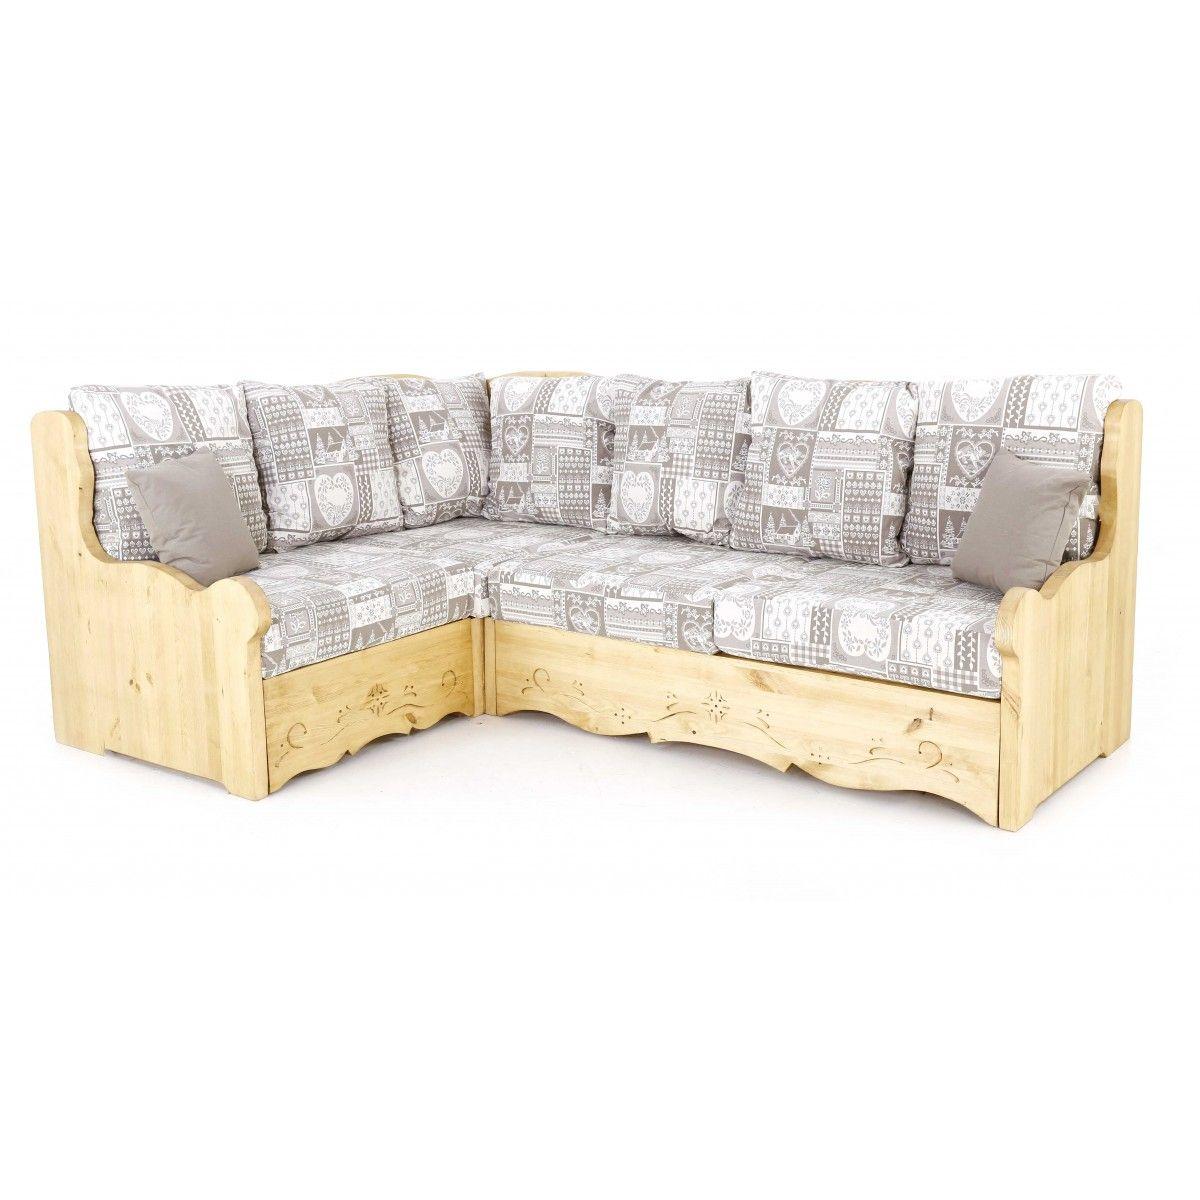 canap d 39 angle montagne gris canap d 39 angle chalet gris canap d 39 angle en pin gris lit. Black Bedroom Furniture Sets. Home Design Ideas